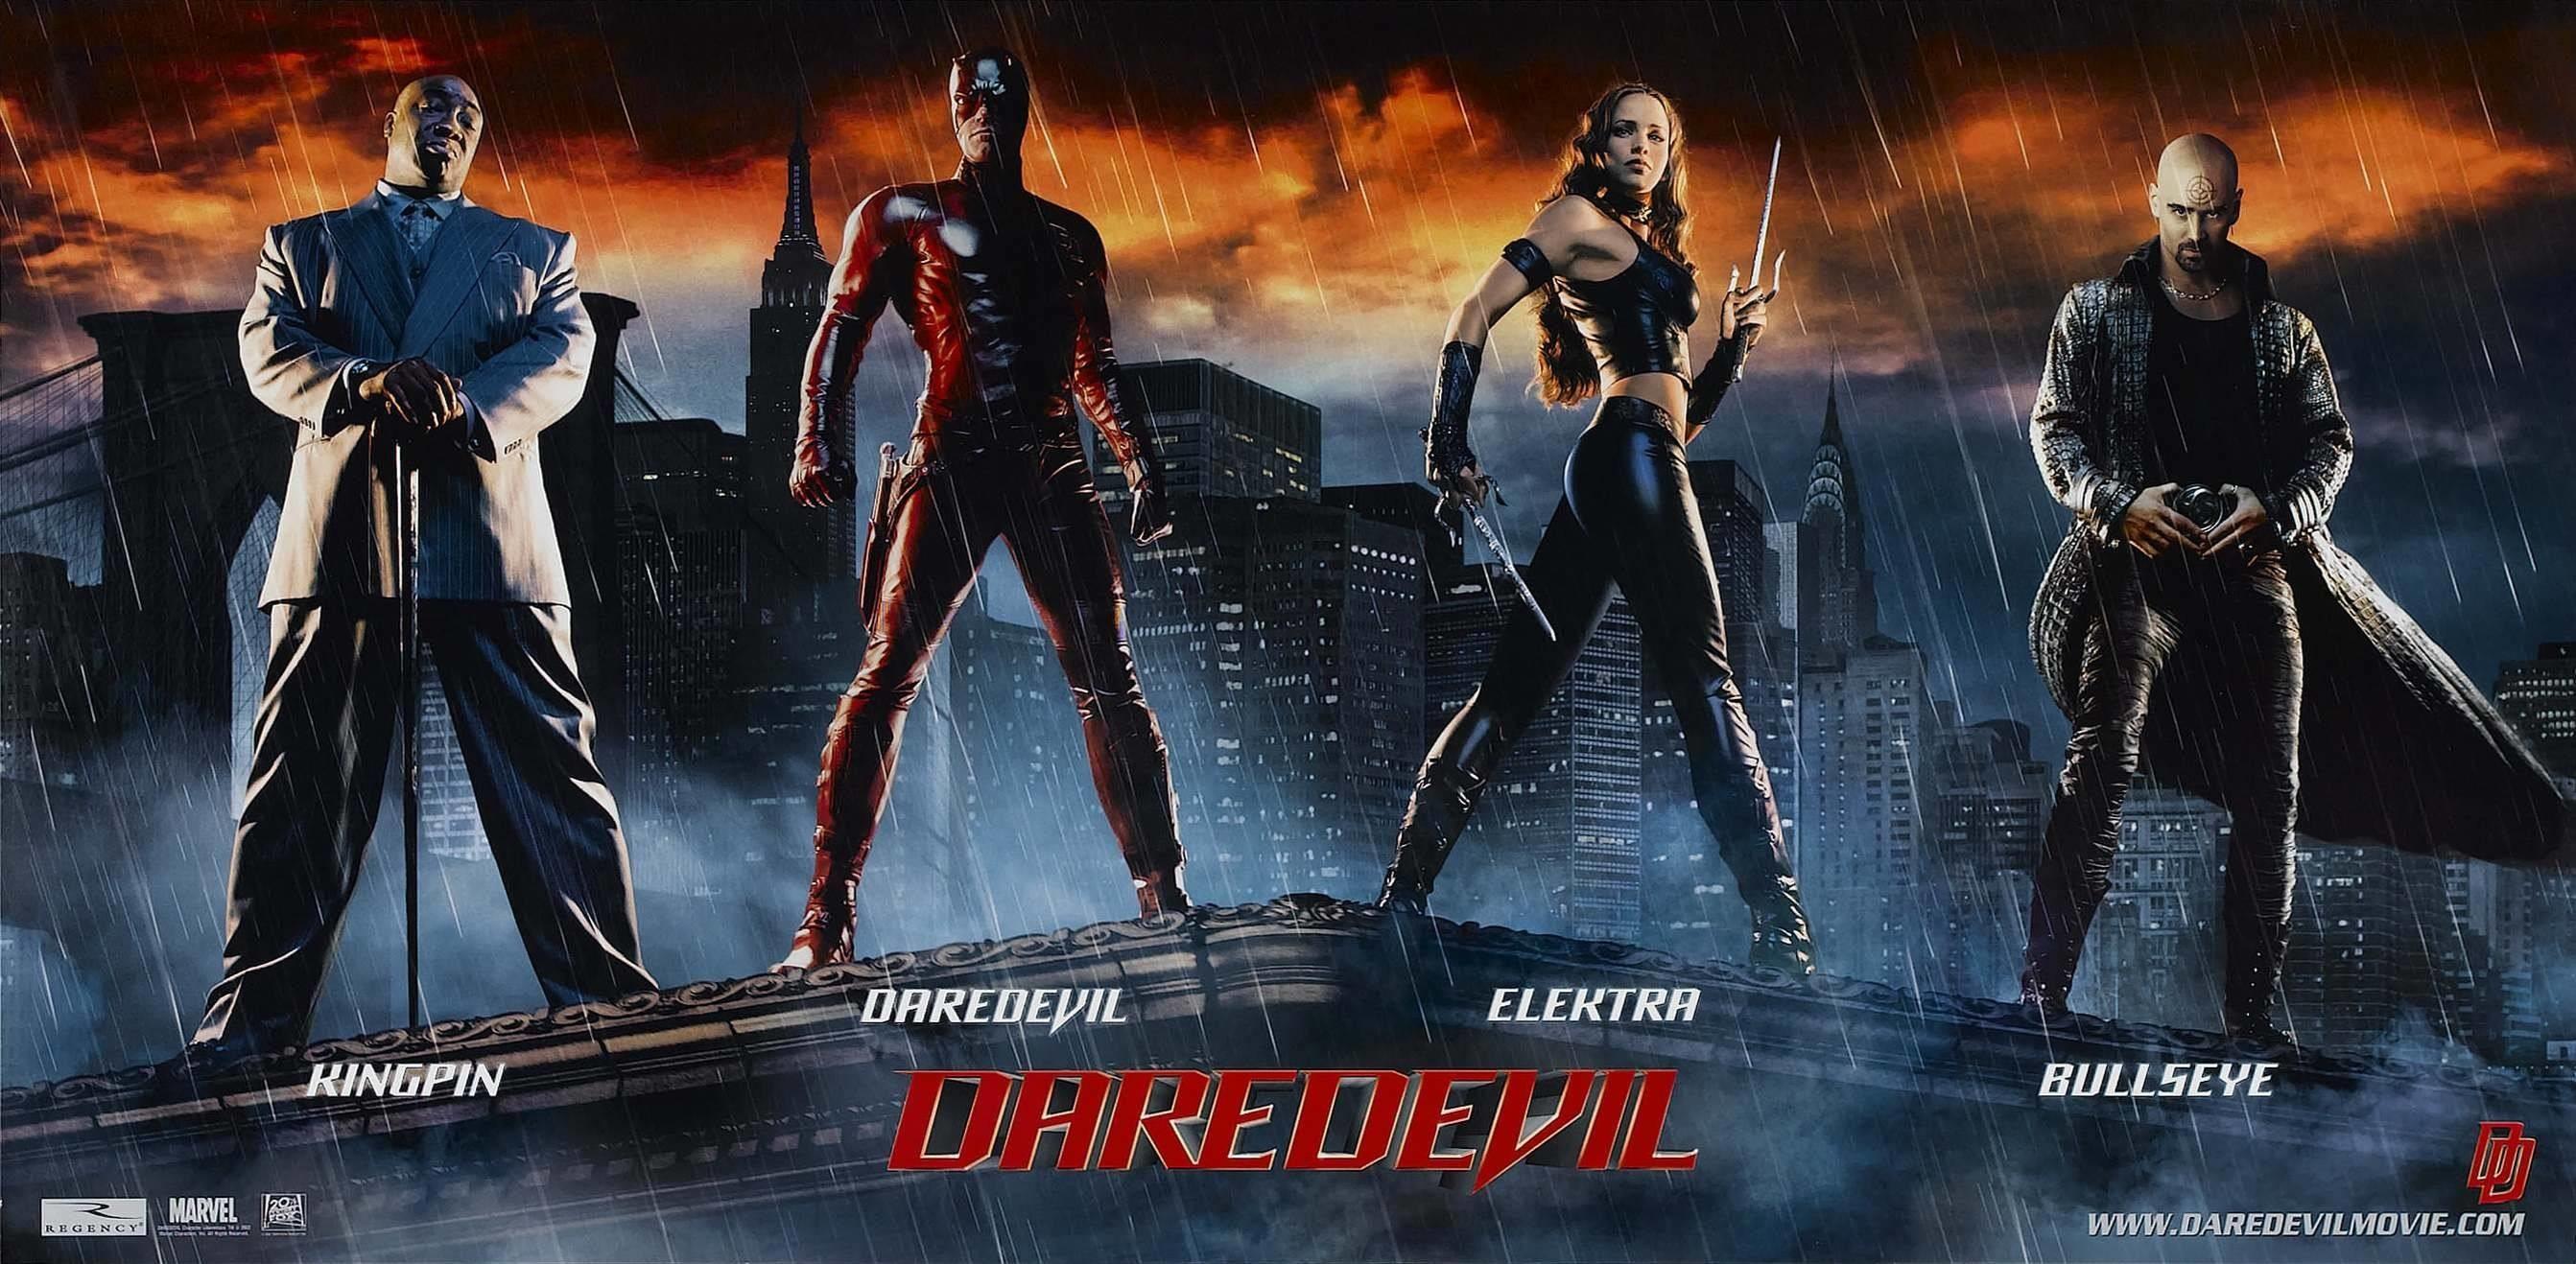 Daredevil Movie Wallpapers Widescreen